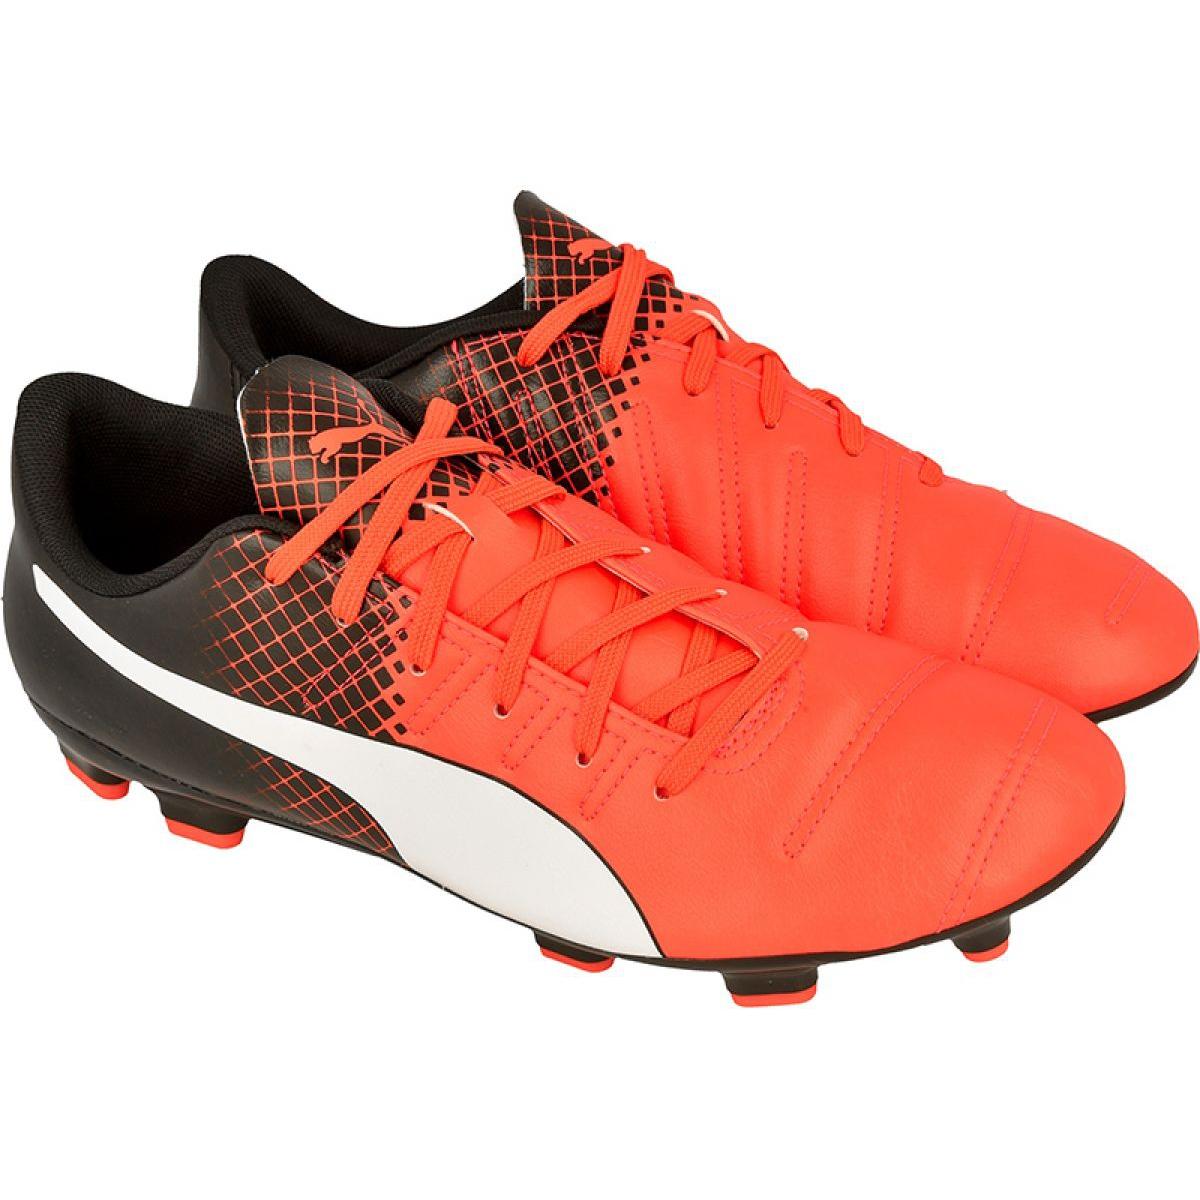 Chaussures-de-football-Puma-evoPOWER-4-3-Fg-M-10358503